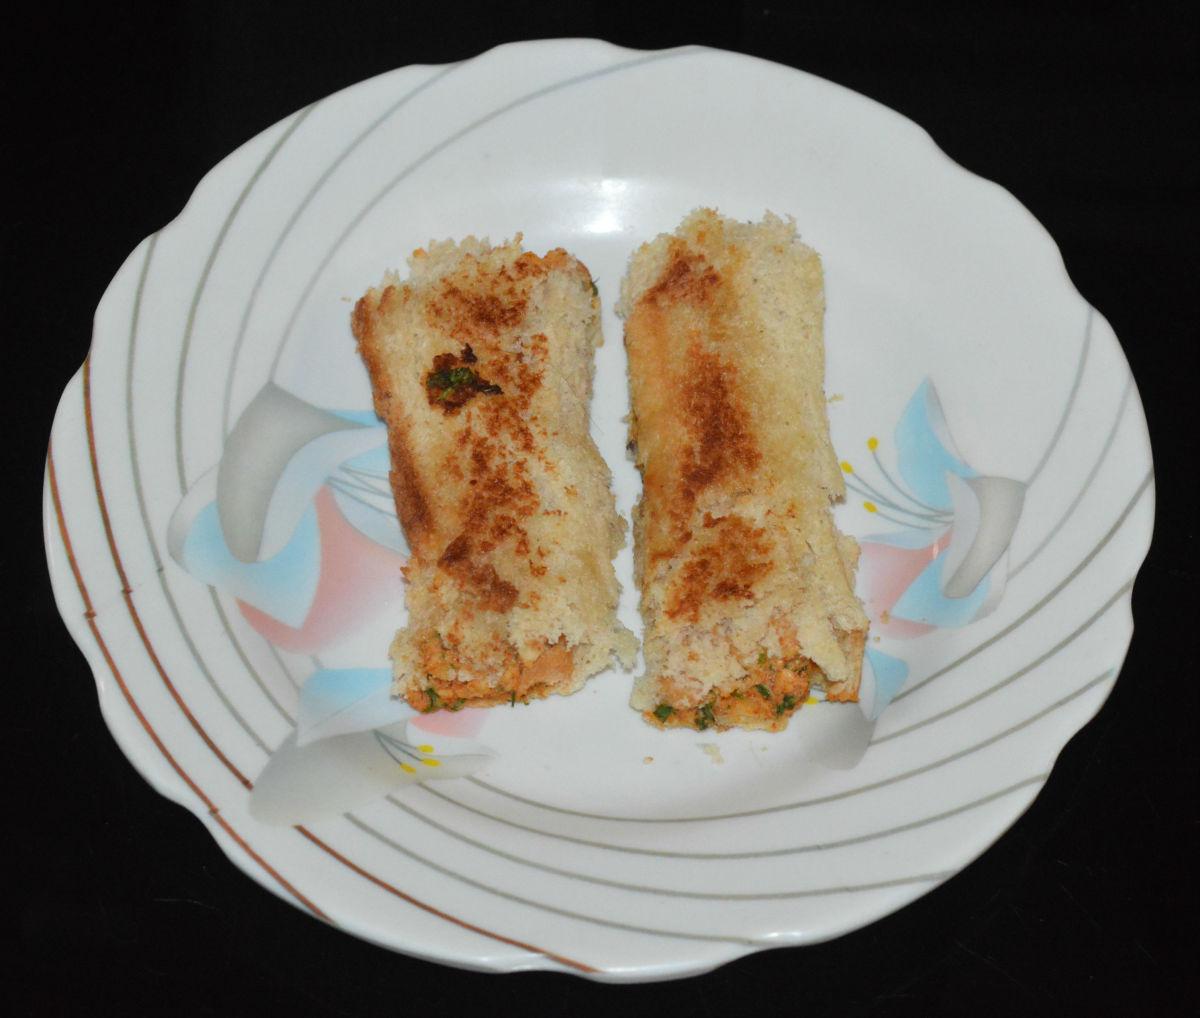 Kids' Snacks: How to Make Paneer Bread Rolls